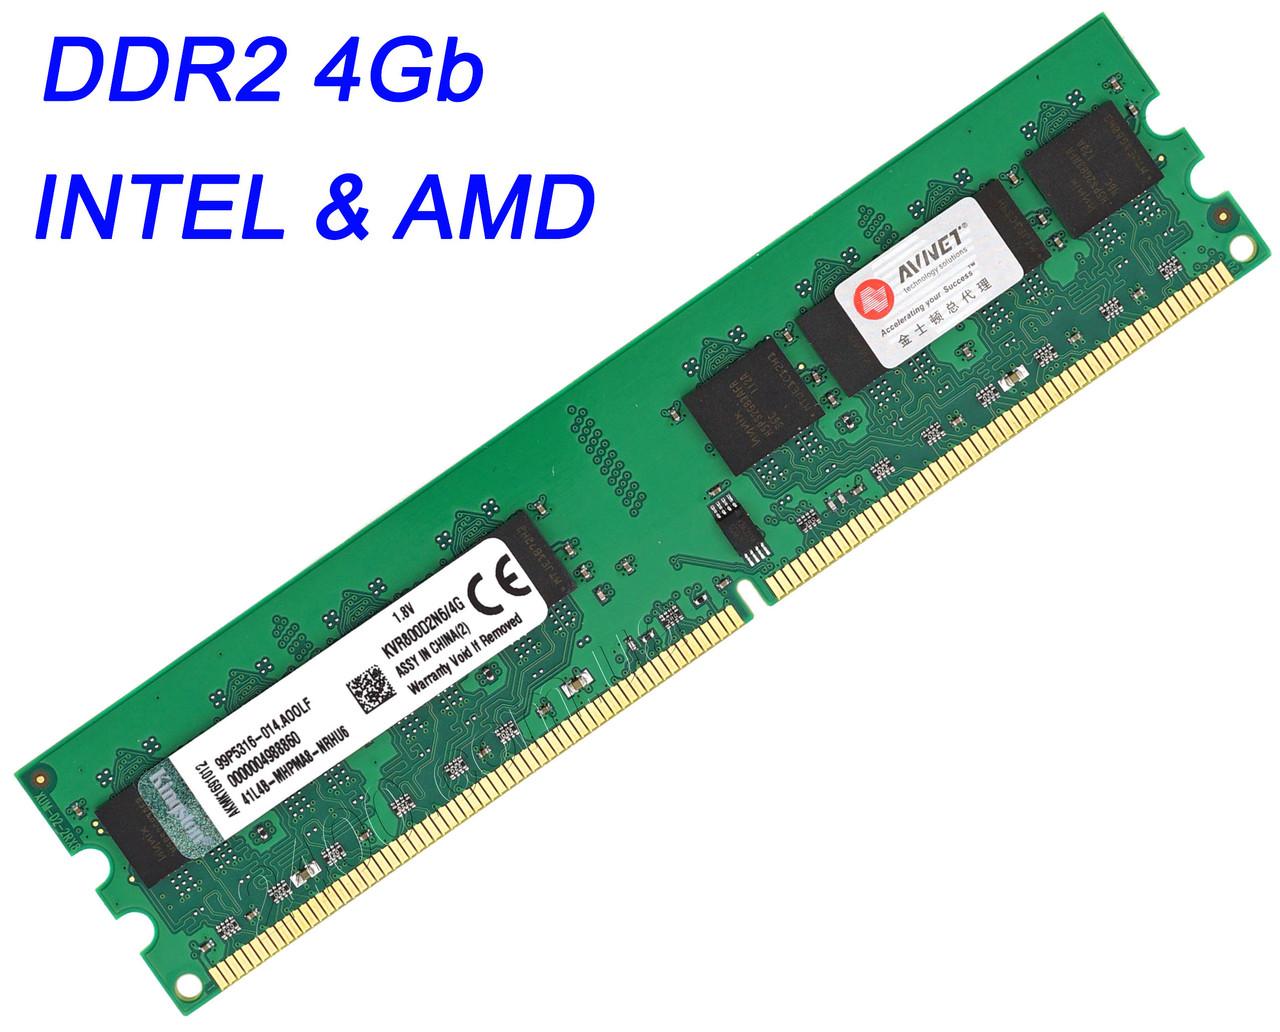 DDR2-800-4Gb-Intel-RAM-memory-Kingston